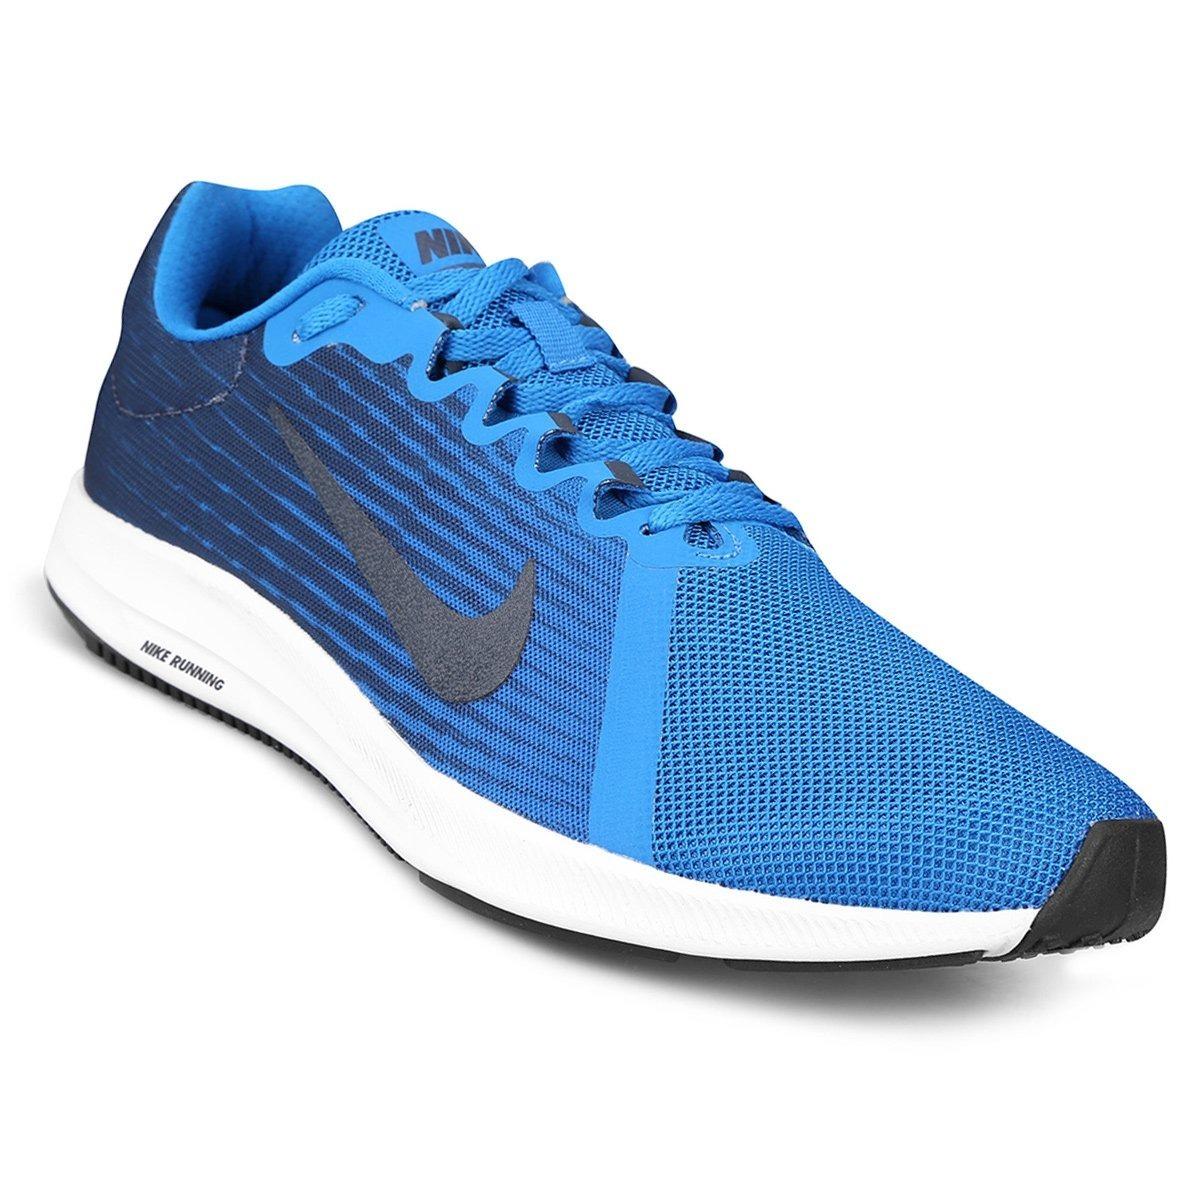 eac2216f4 Zapatillas Nike Downshifter 8 - En Azul - $ 3.776,00 en Mercado Libre